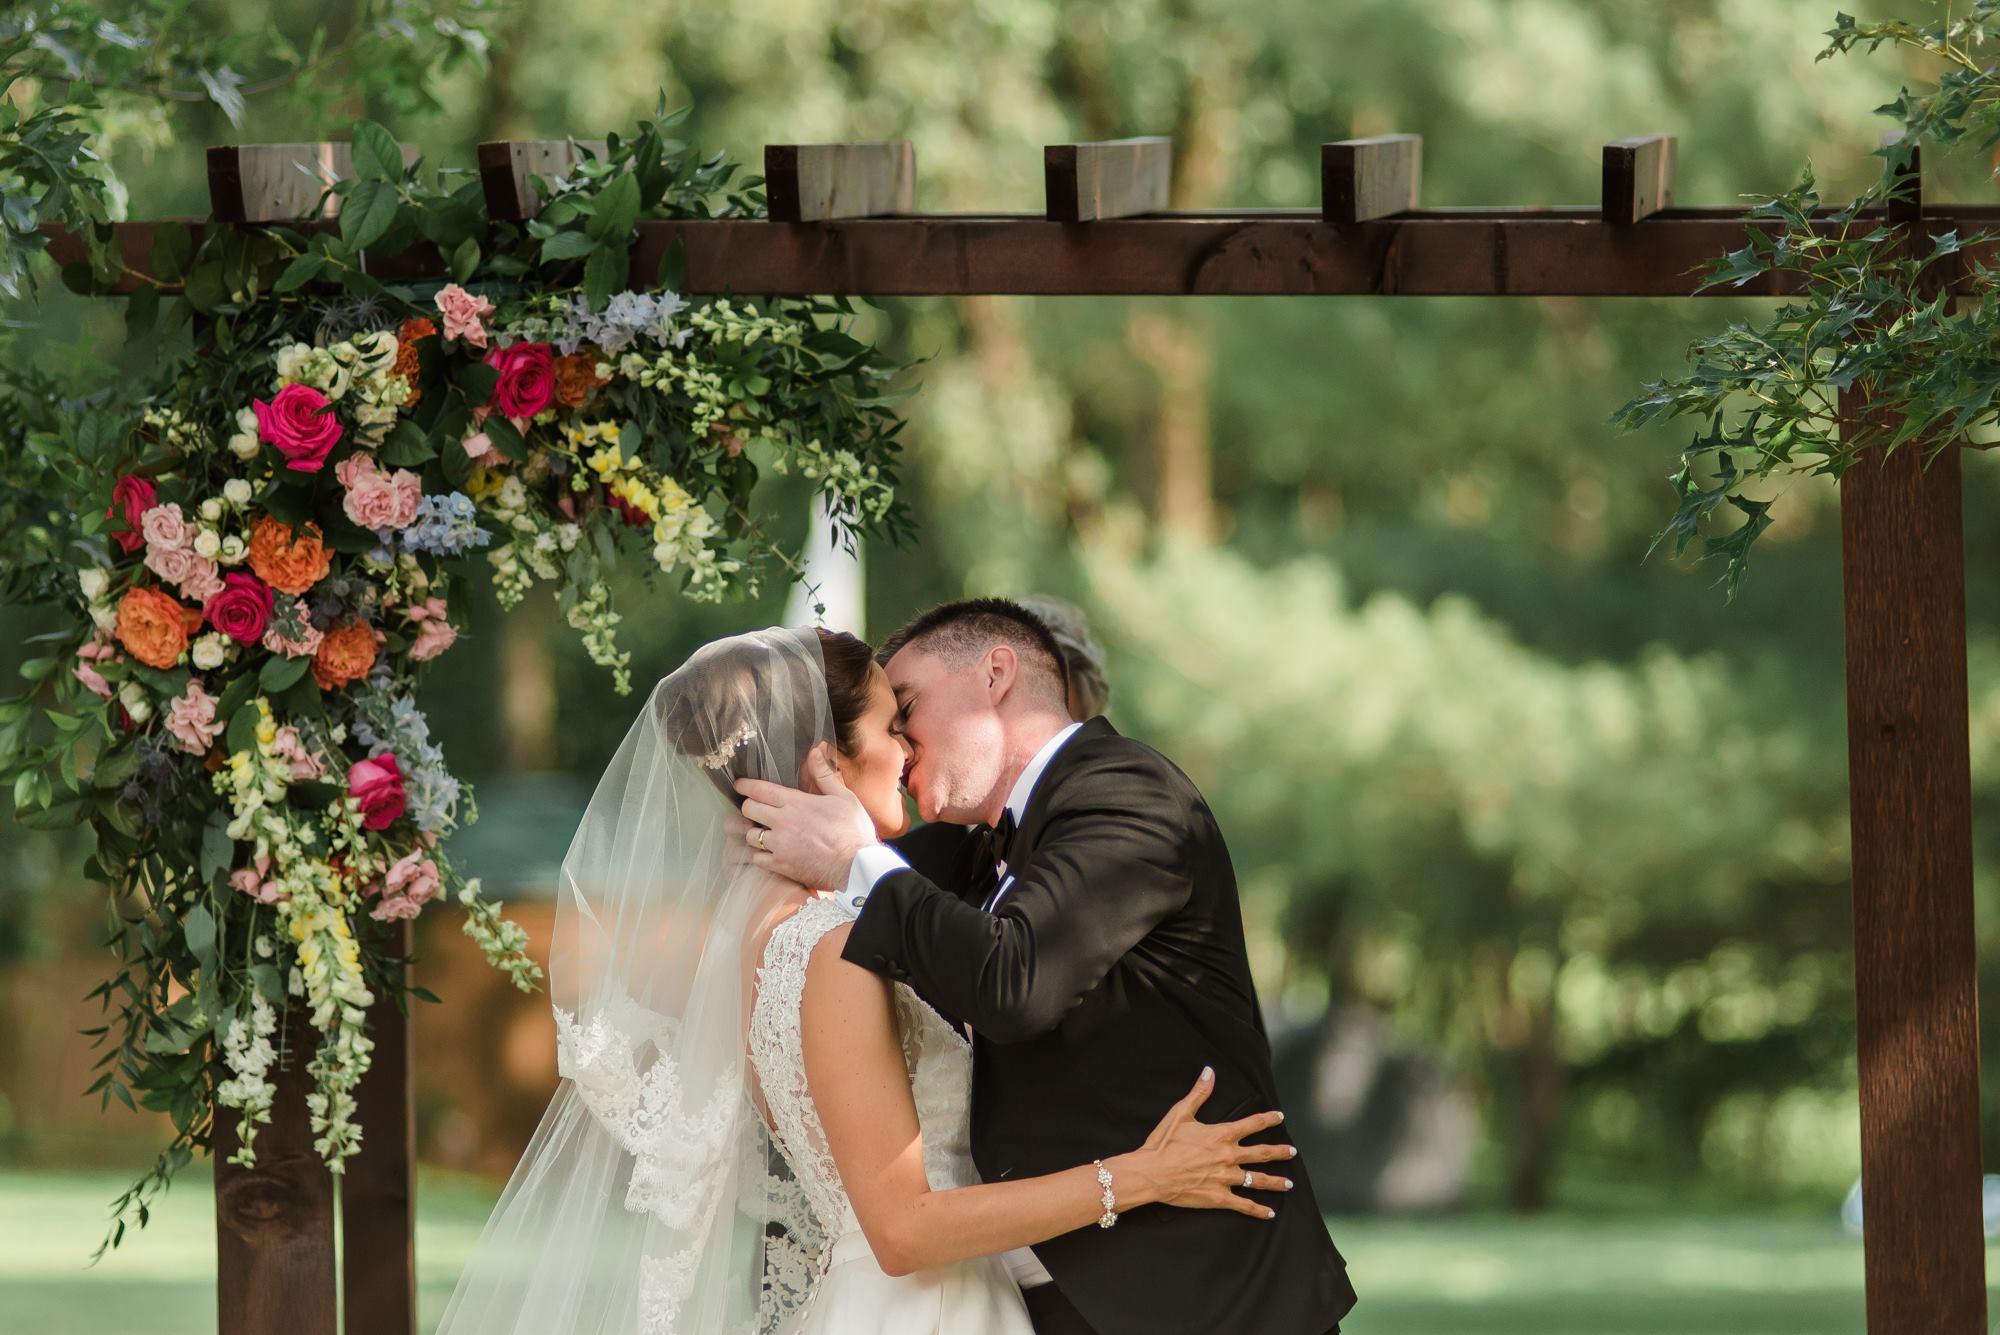 pittsburgh-pennsylvania-backyard-glam-chic-modern-classic-wedding-0025.jpg